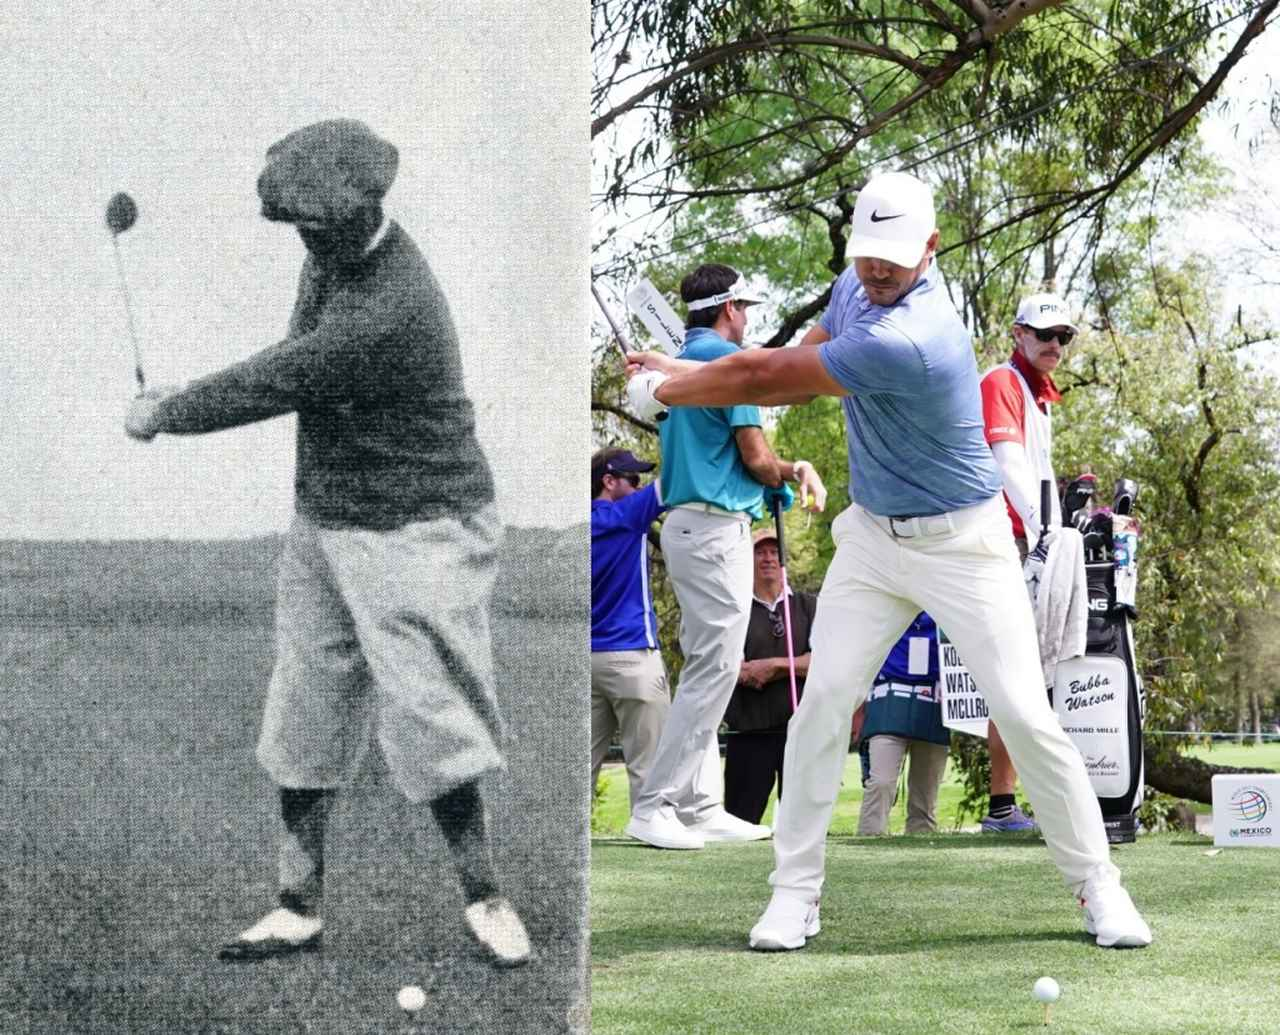 Images : 3番目の画像 - ボビー・ジョーンズとブルックス・ケプカのスウィング比較 - みんなのゴルフダイジェスト